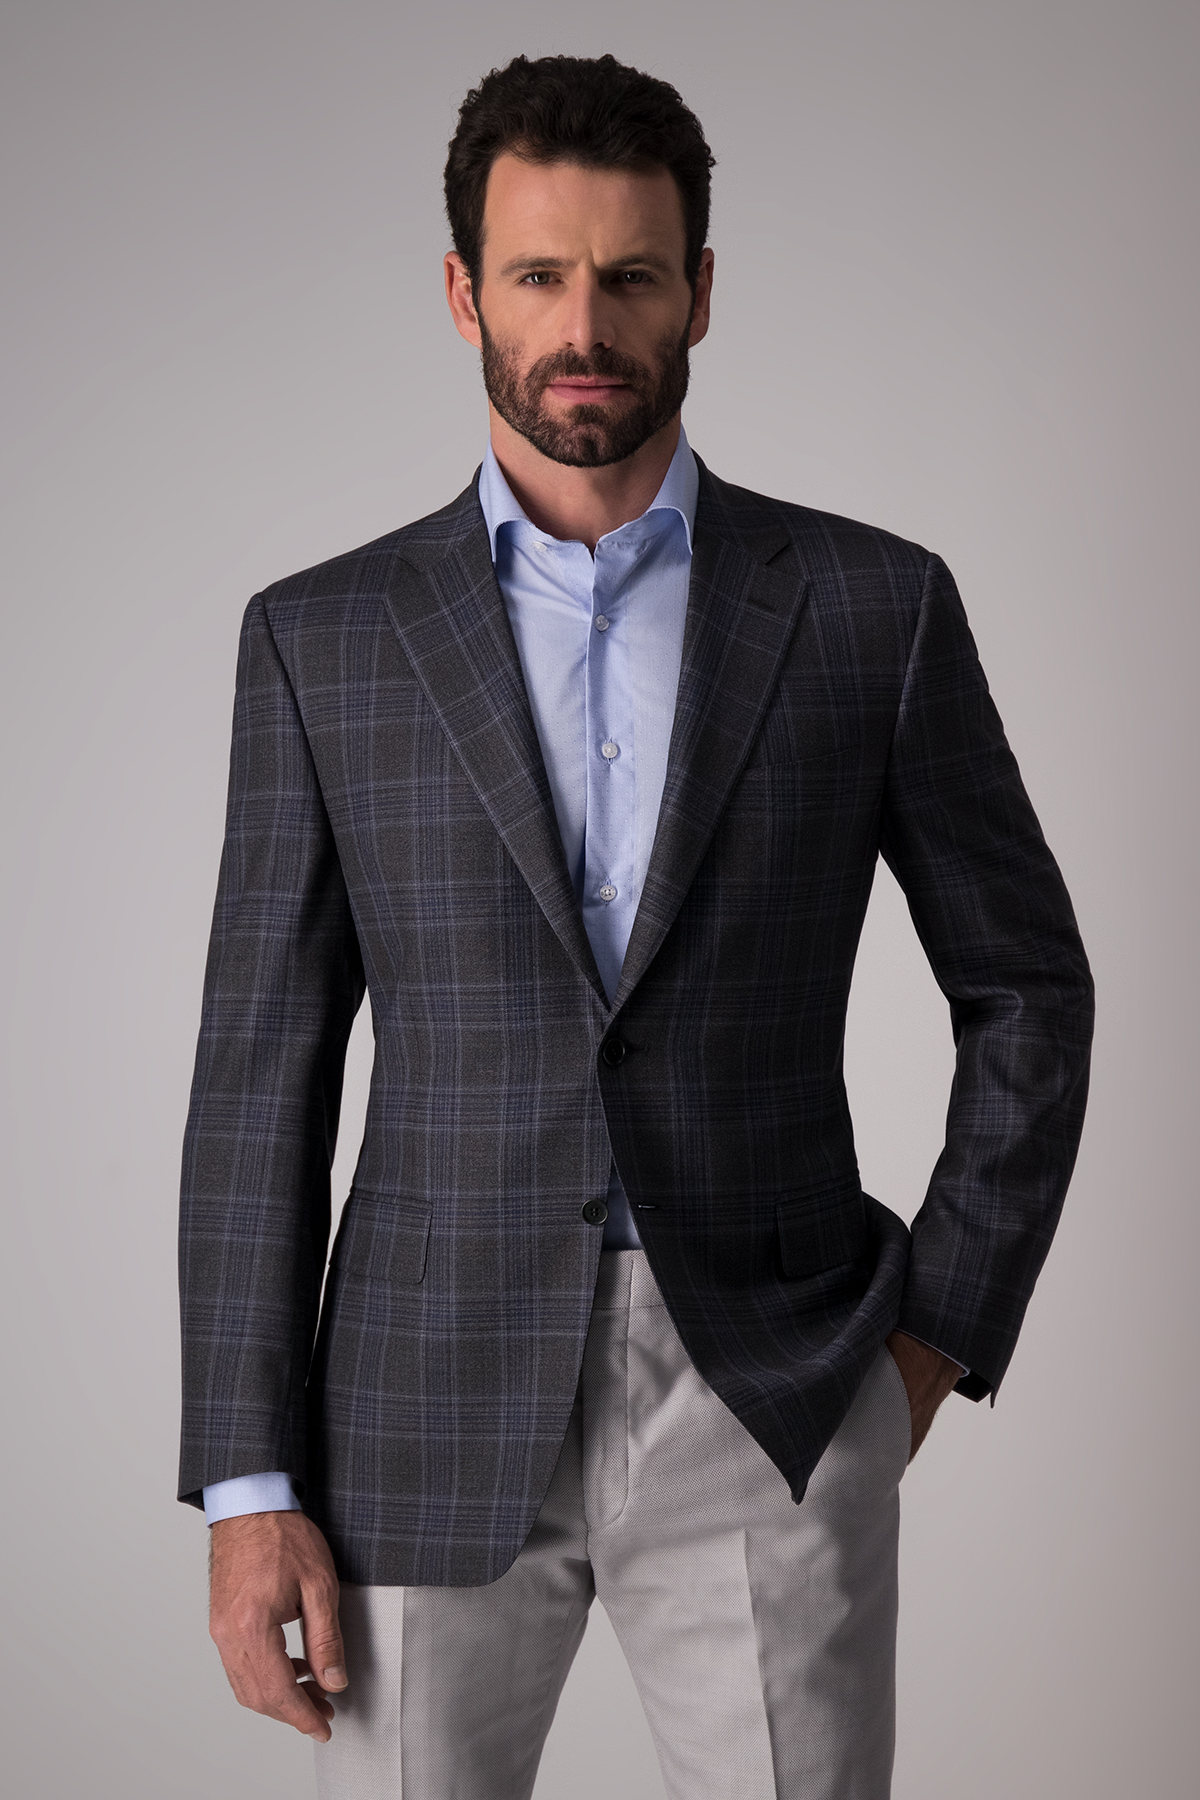 Saco marca Canali, Made in Italy,  gris oxford a cuadros.